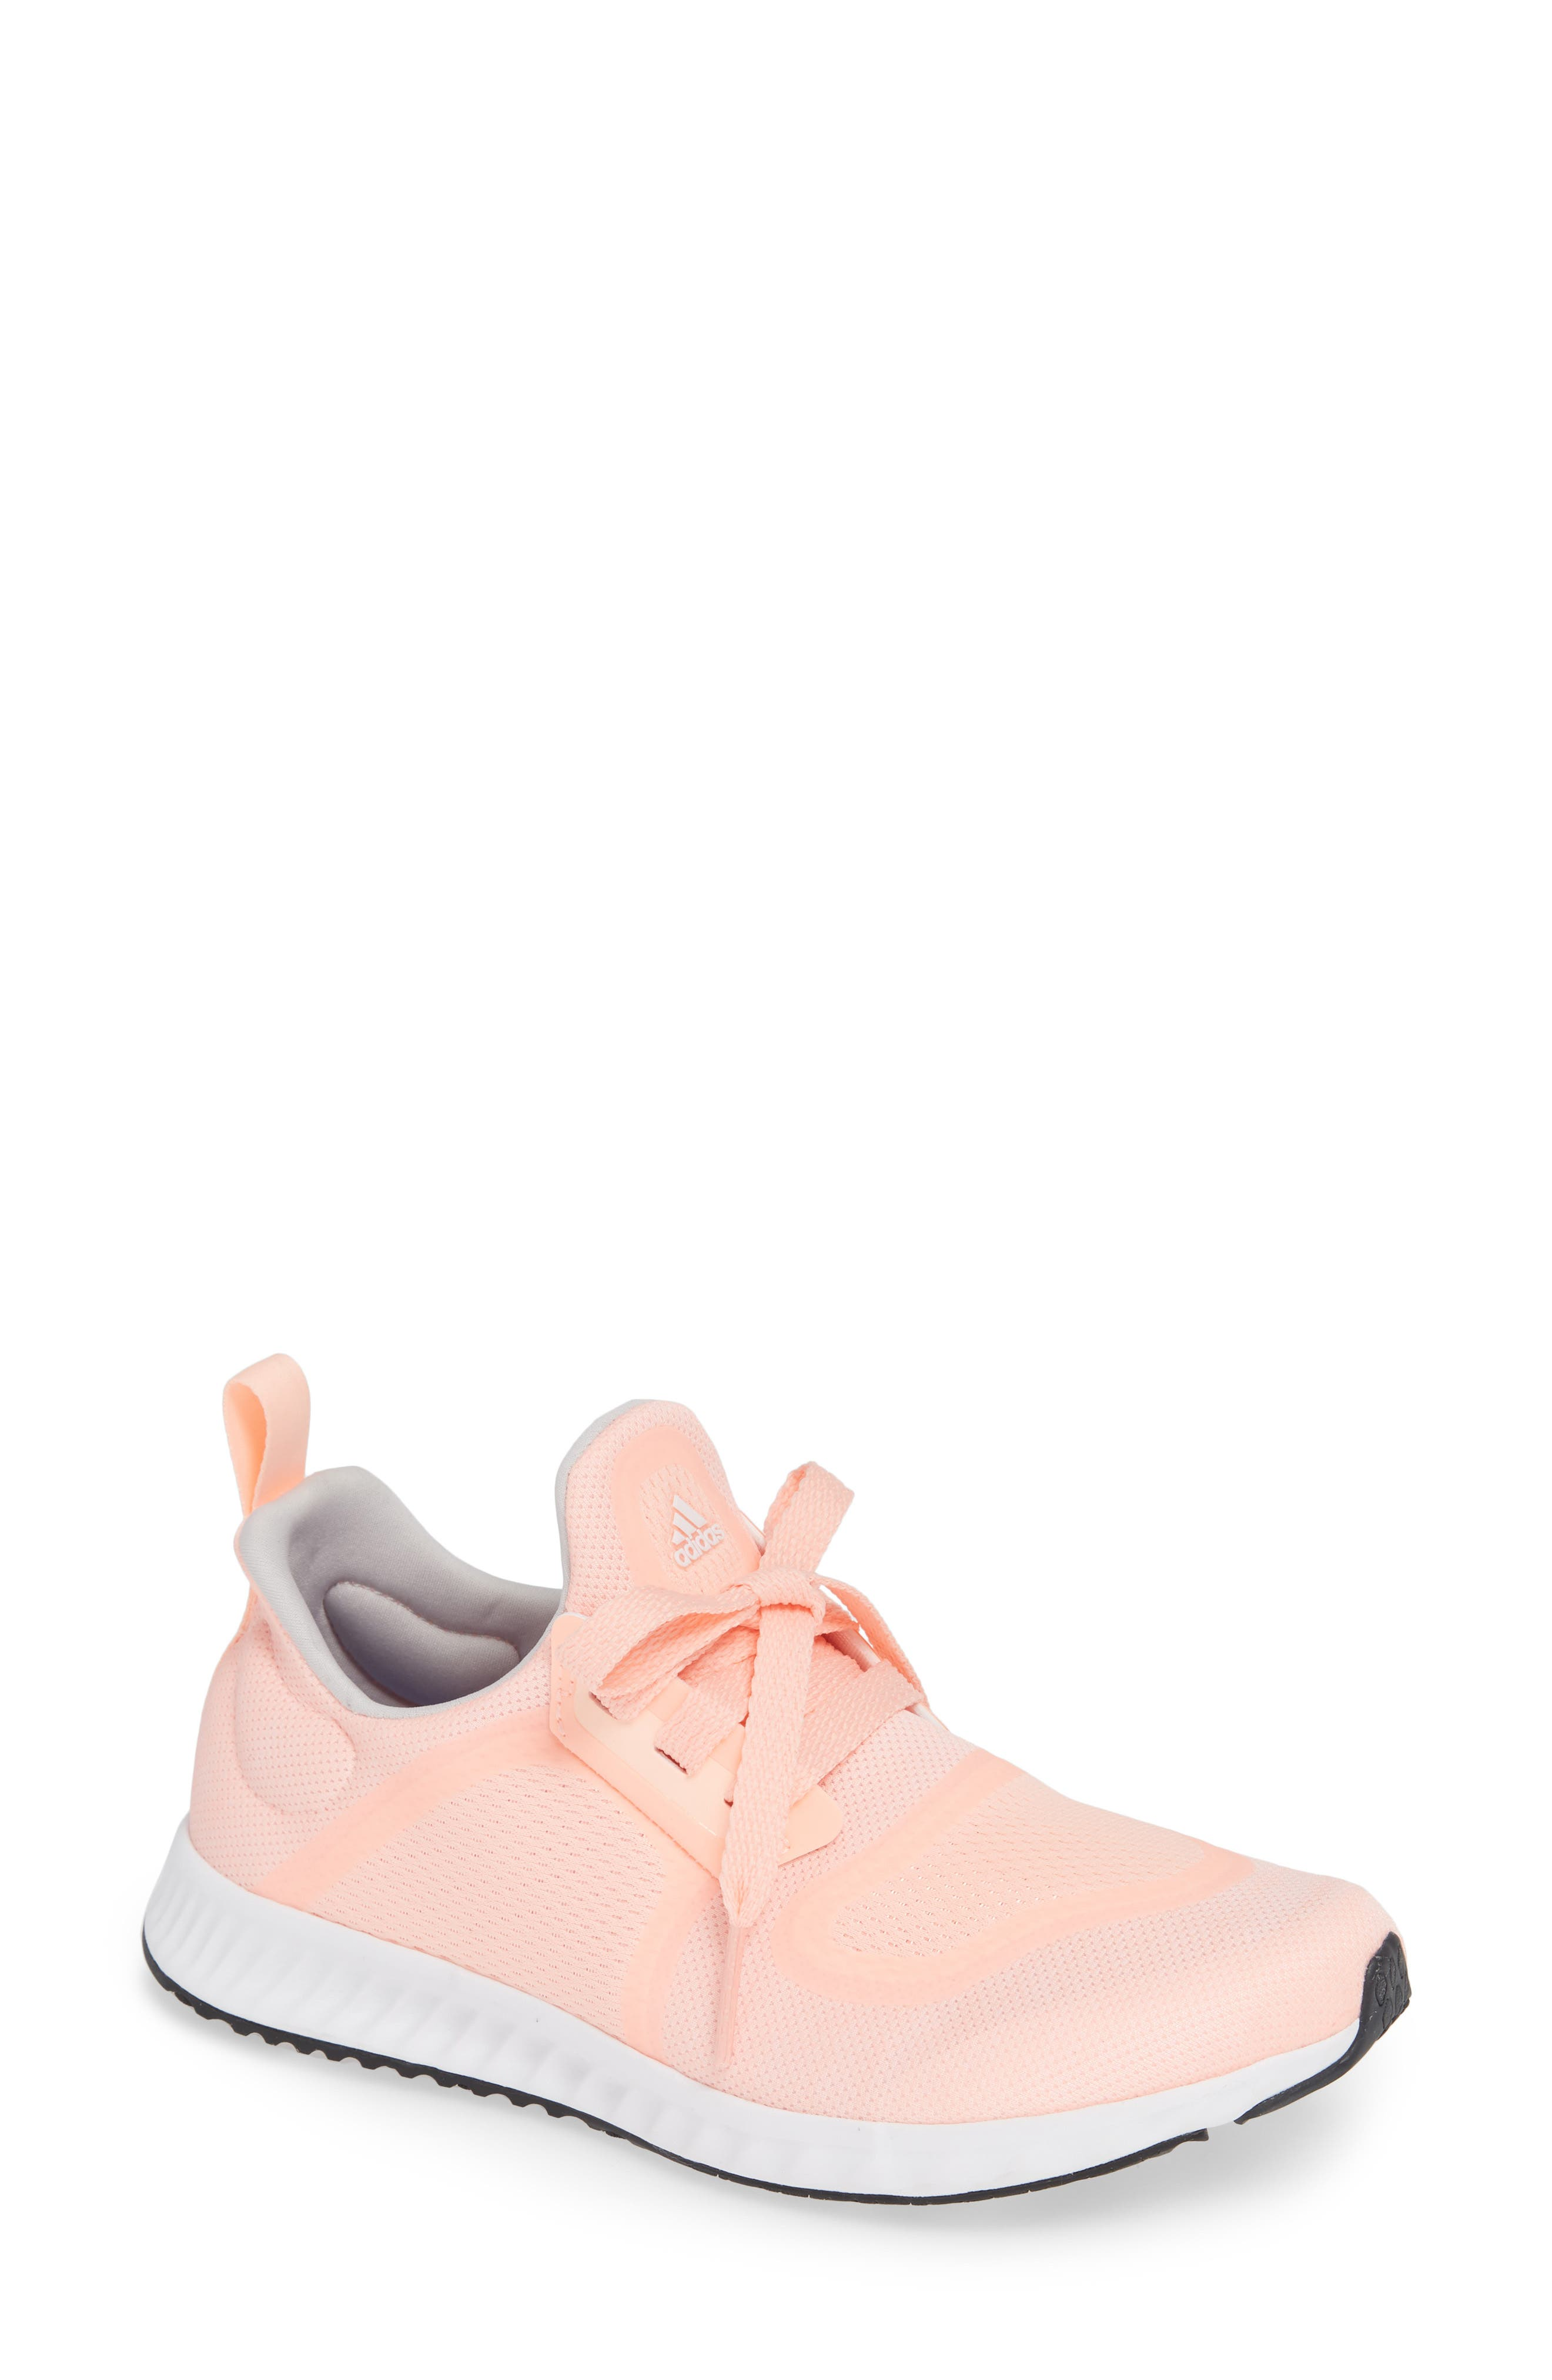 adidas rose running shoes